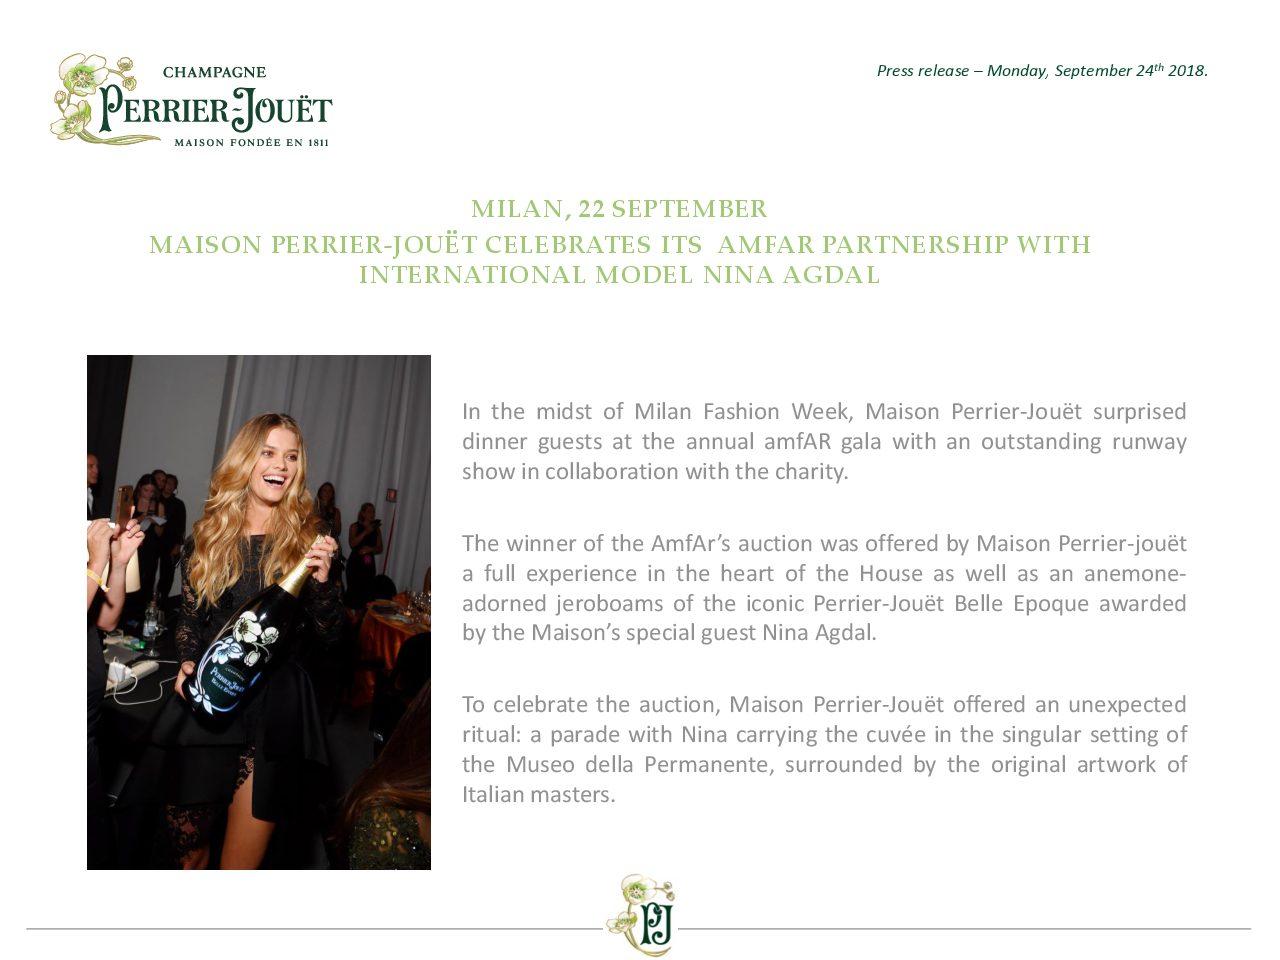 Press Release Maison Perrier-Jouët celebrates its amfar partnership with international model nina agdal